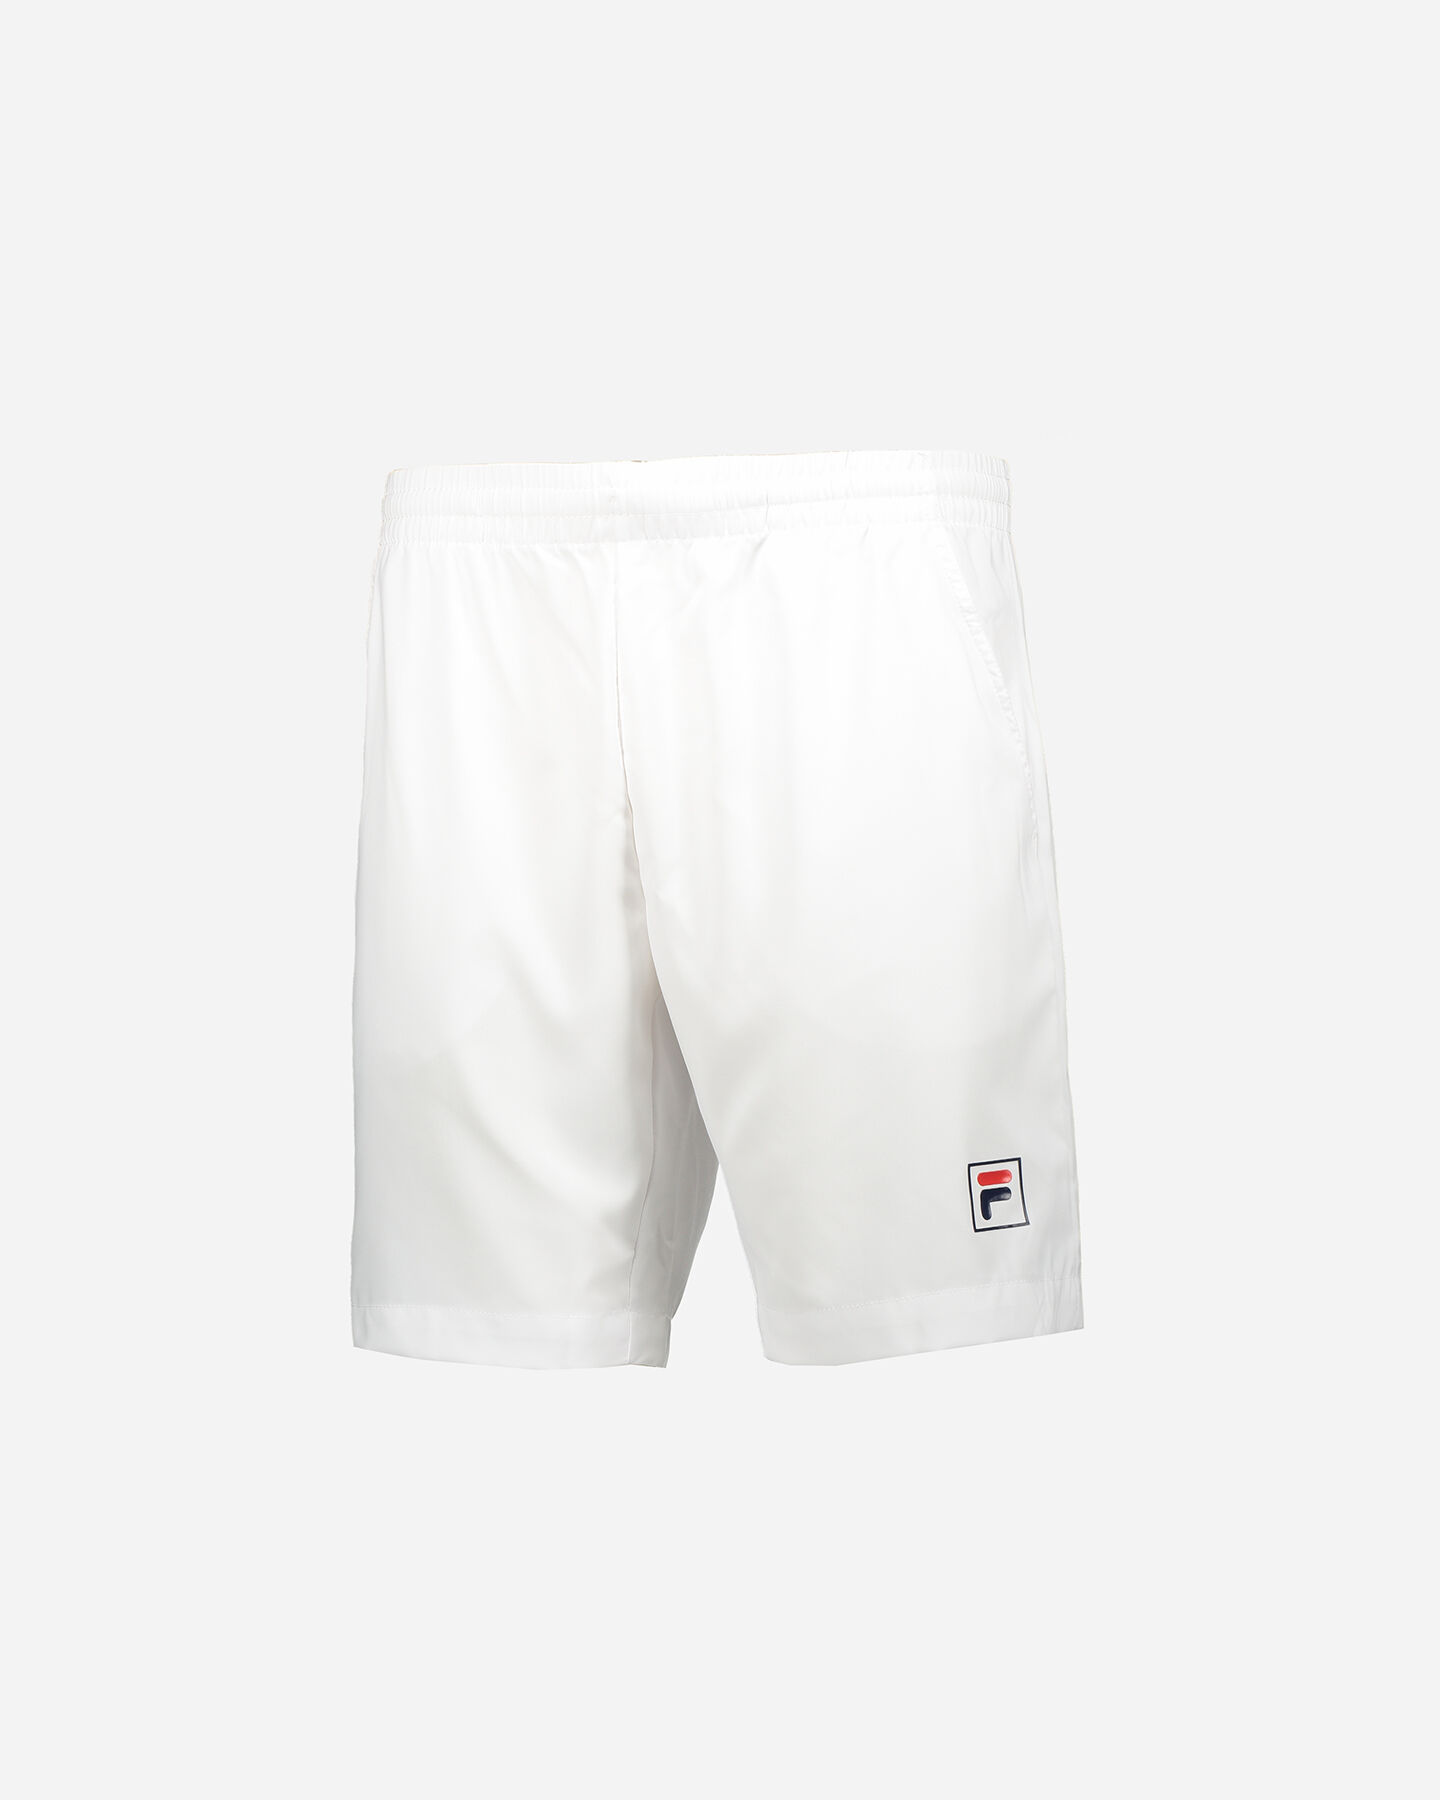 Sport Cisalfa Su Da In Uomo Pantaloncini Tennis Vendita Online f48qTxR